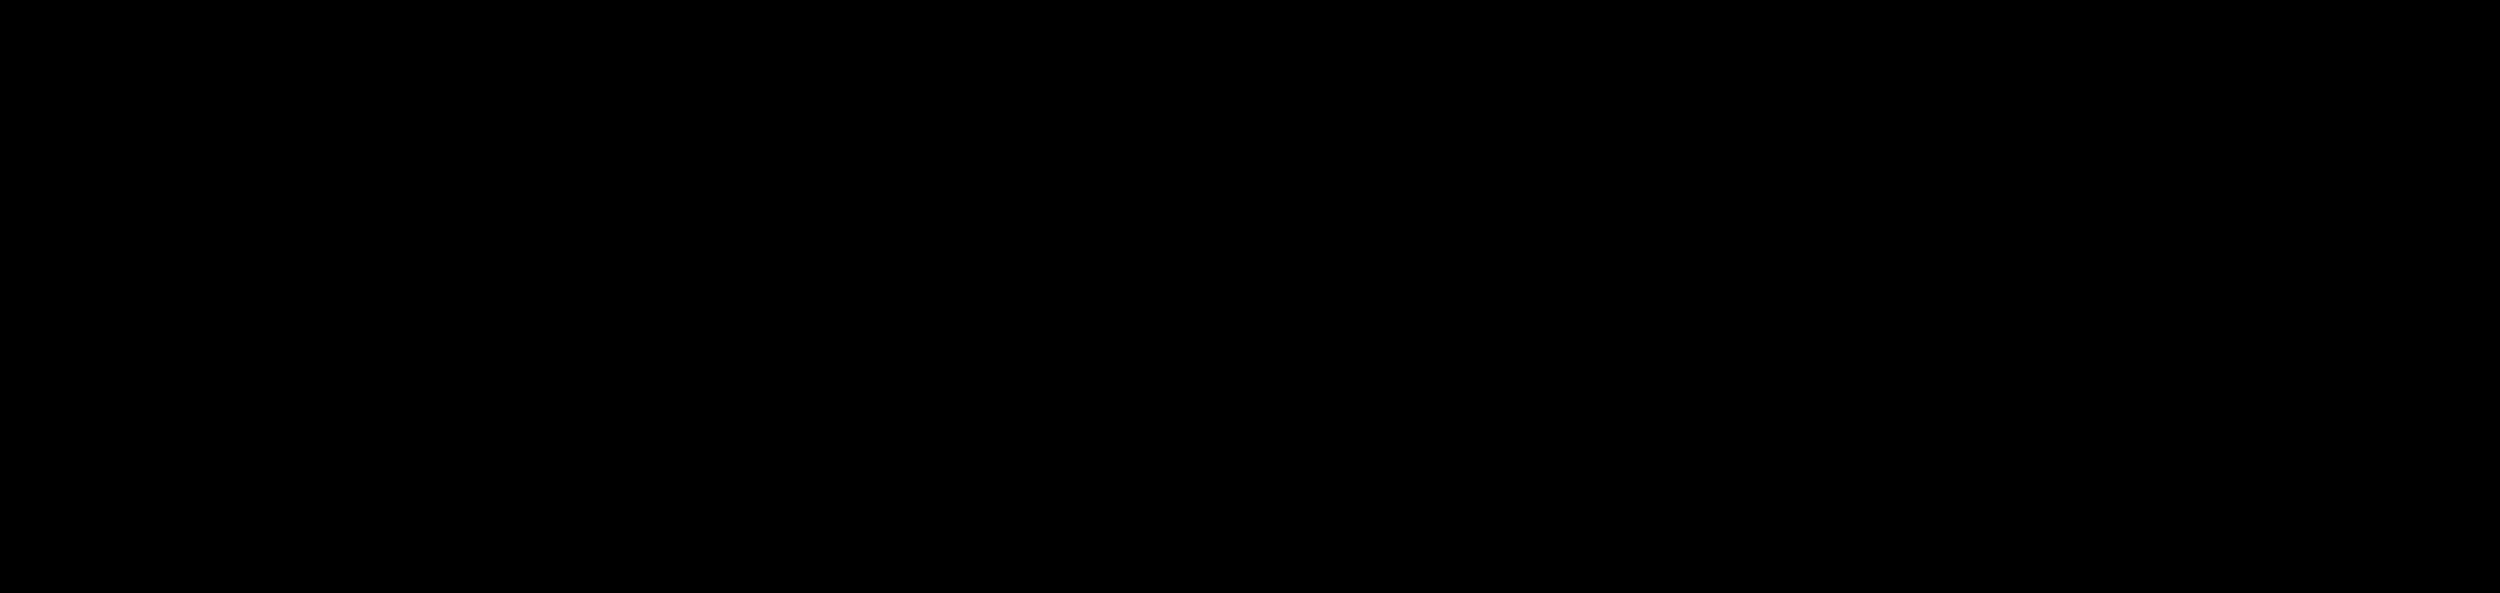 SYM-03.png